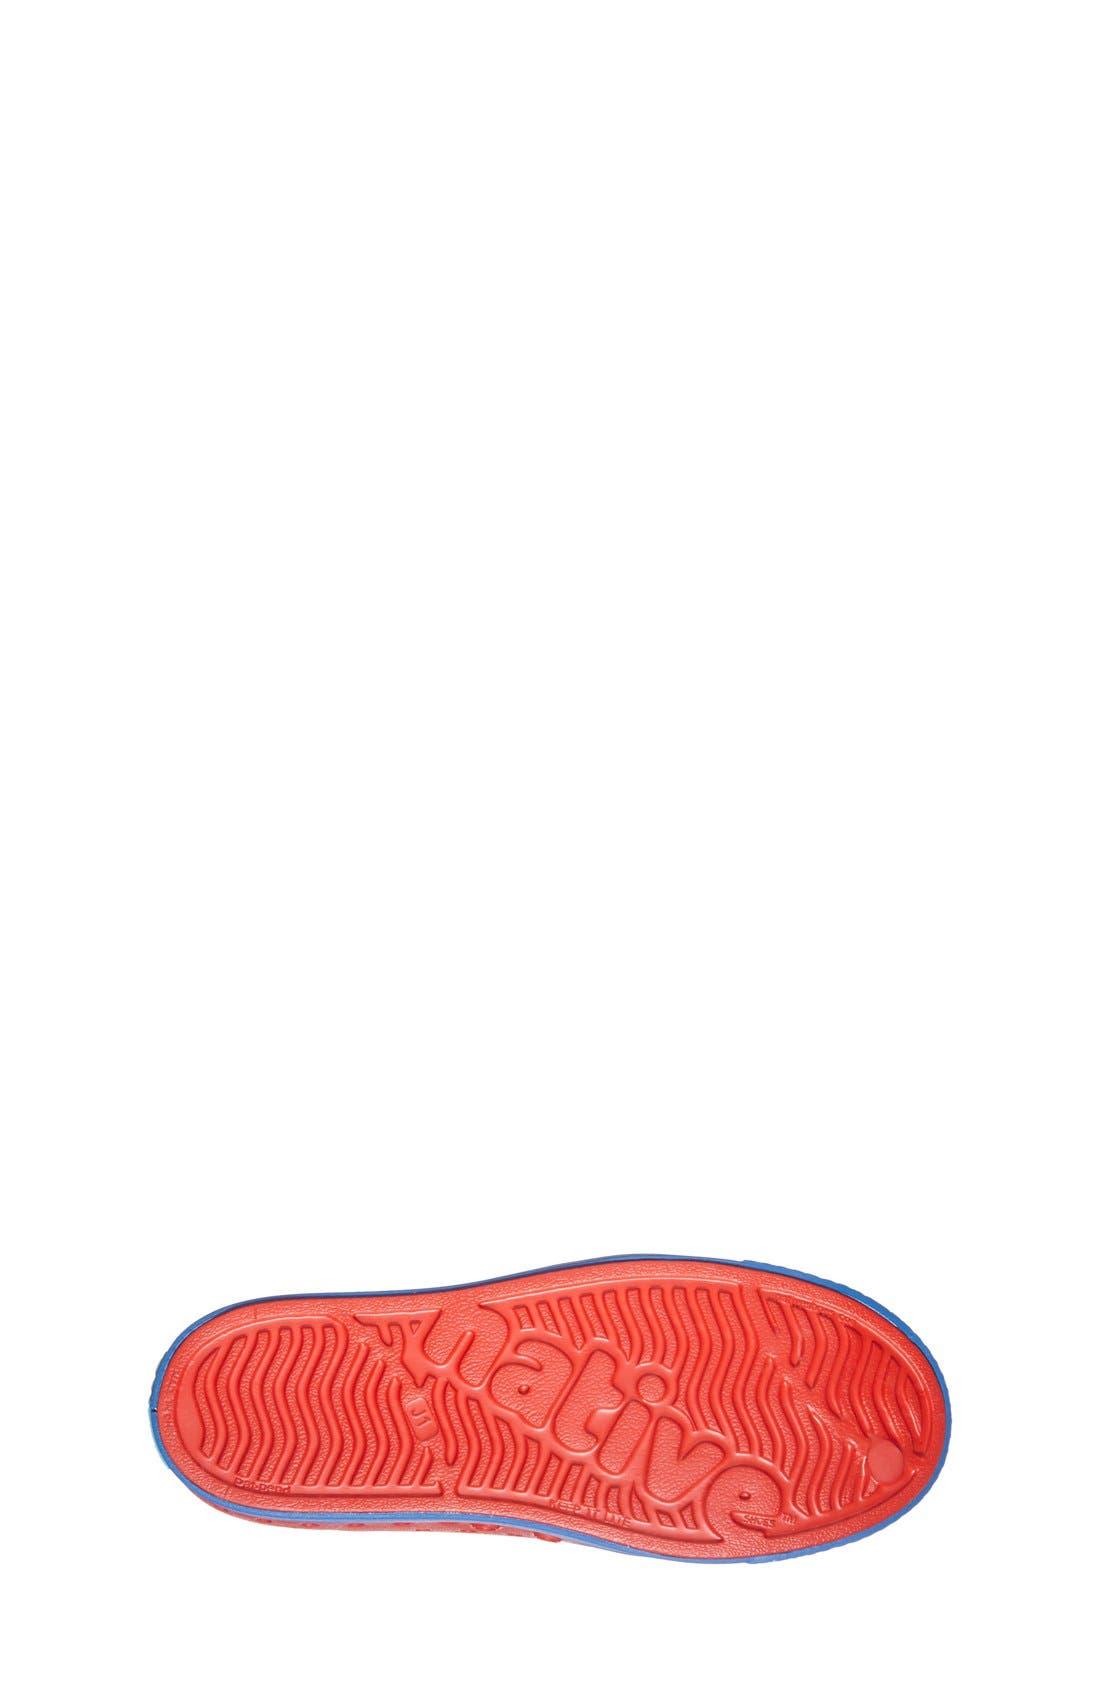 'Jefferson' Water Friendly Slip-On Sneaker,                             Alternate thumbnail 216, color,